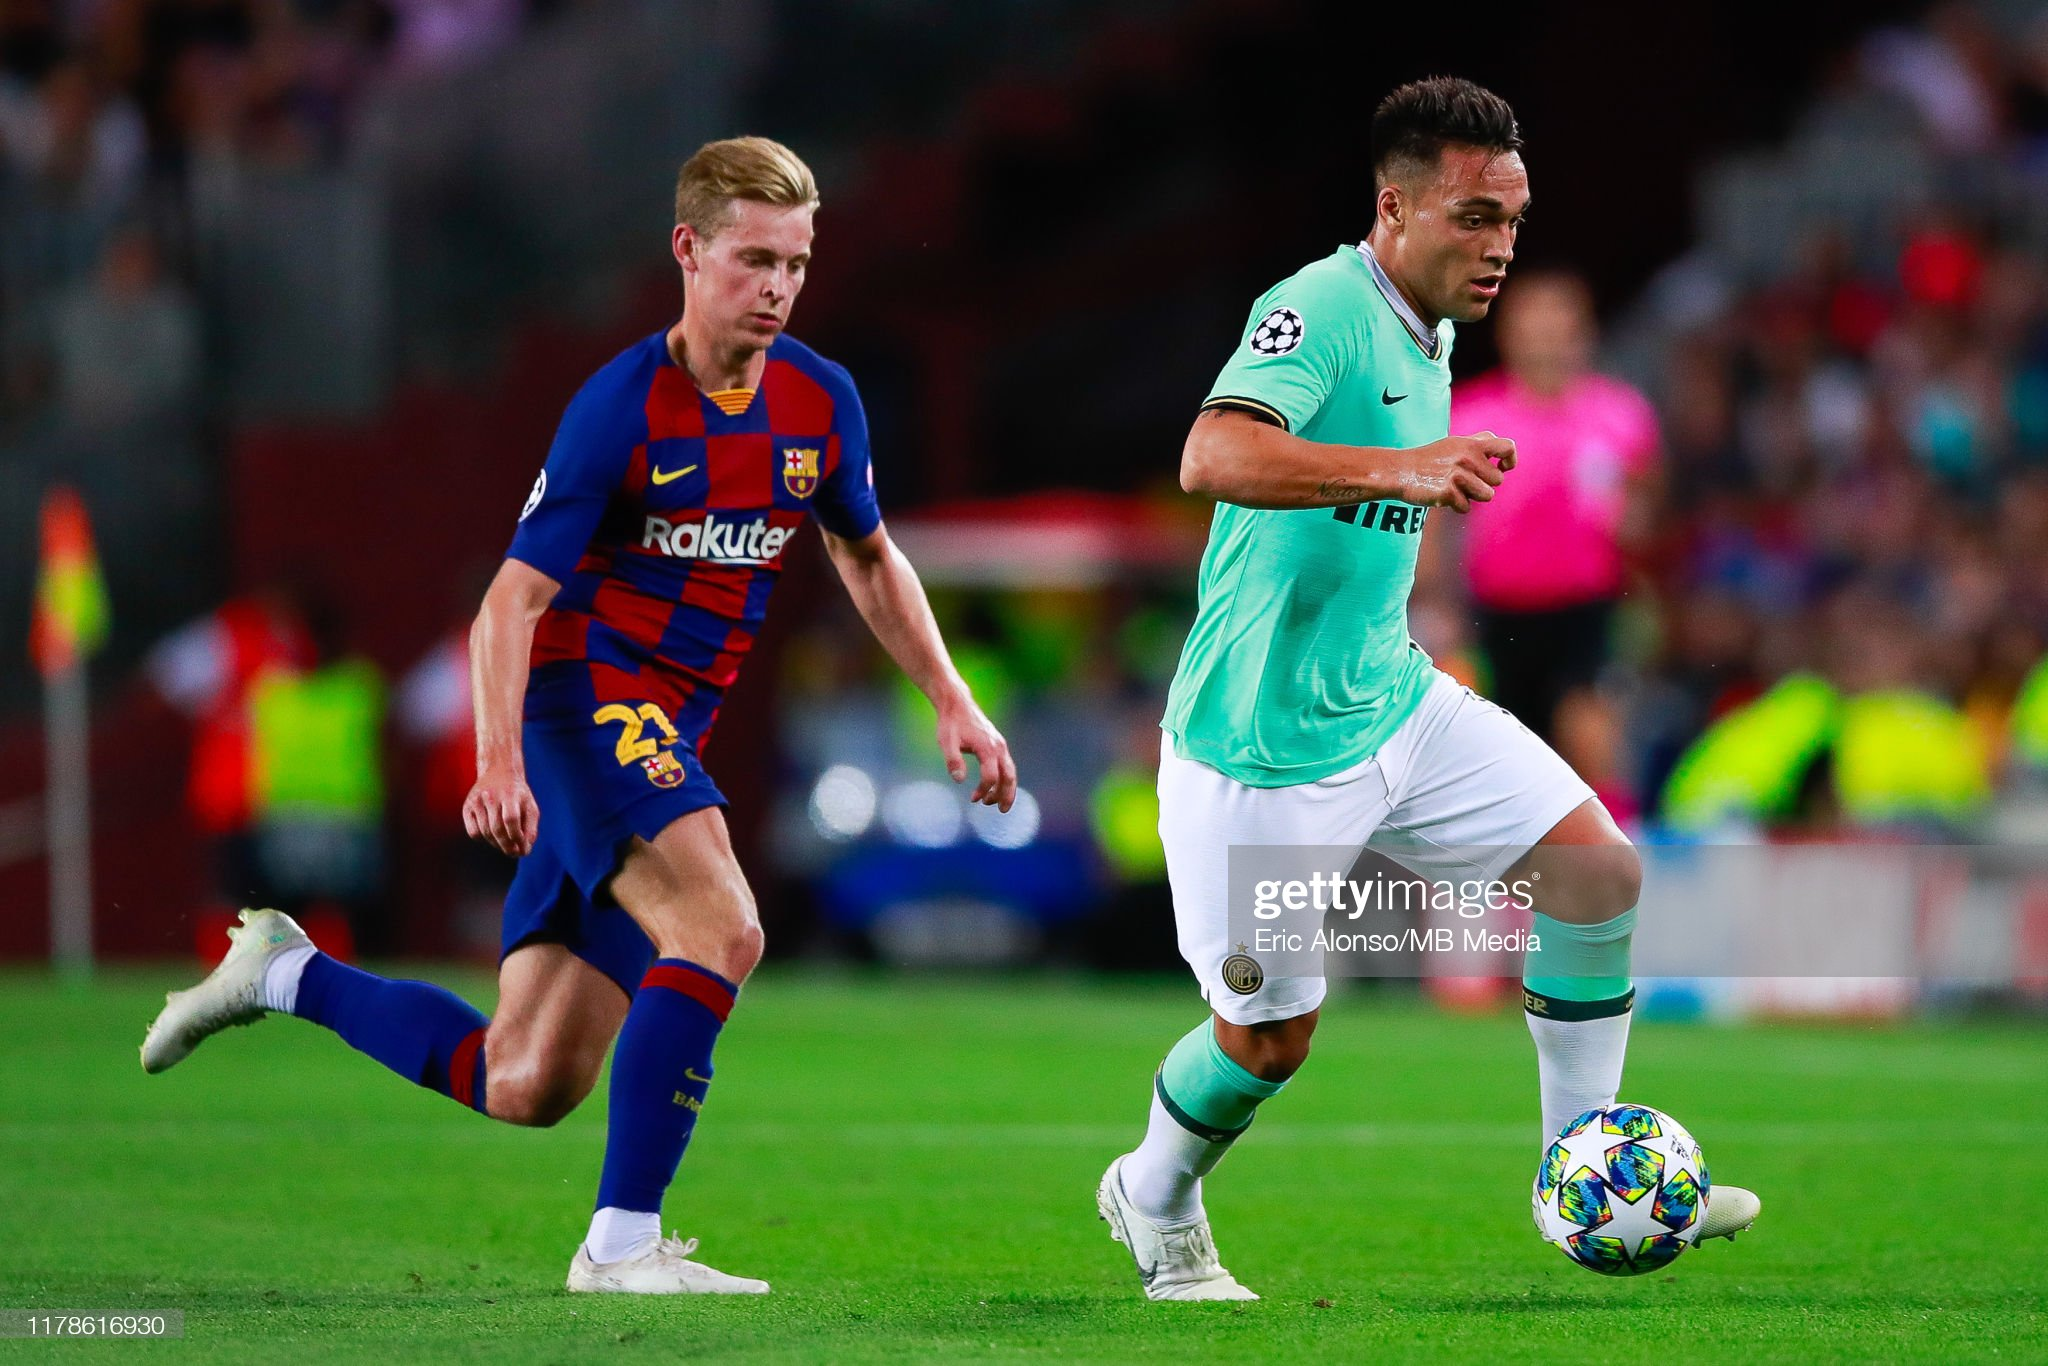 صور مباراة : برشلونة - إنتر 2-1 ( 02-10-2019 )  Lautaro-martinez-of-fc-internazionale-fight-for-the-ball-against-de-picture-id1178616930?s=2048x2048